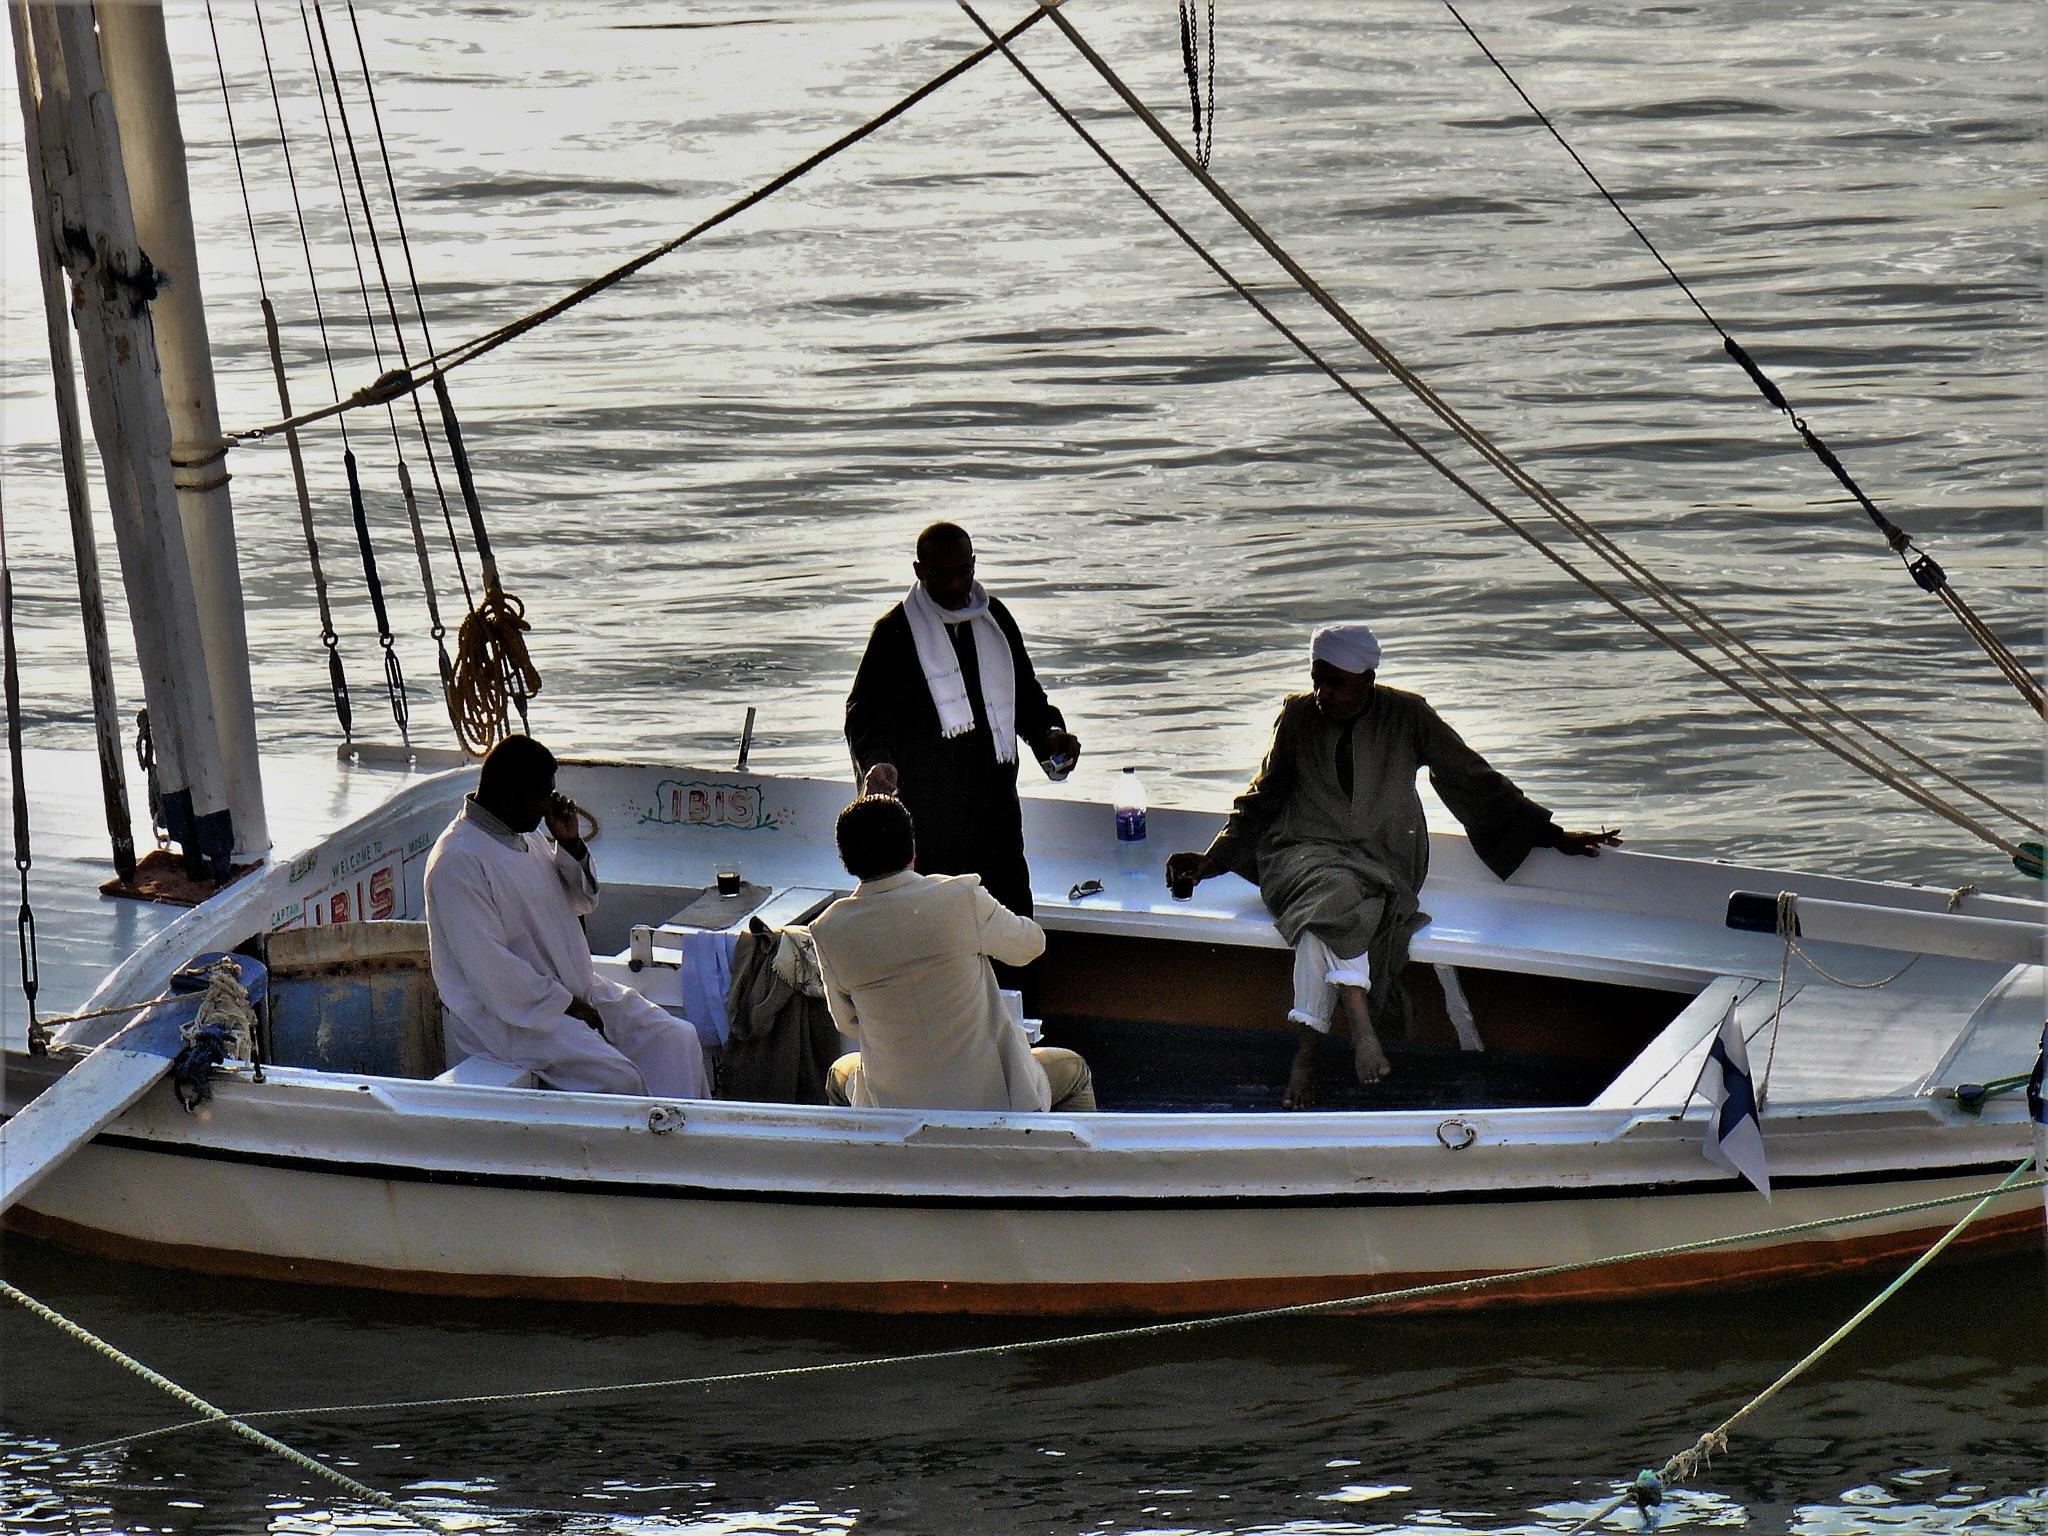 Felucca on the Nile by Edualc Eznad